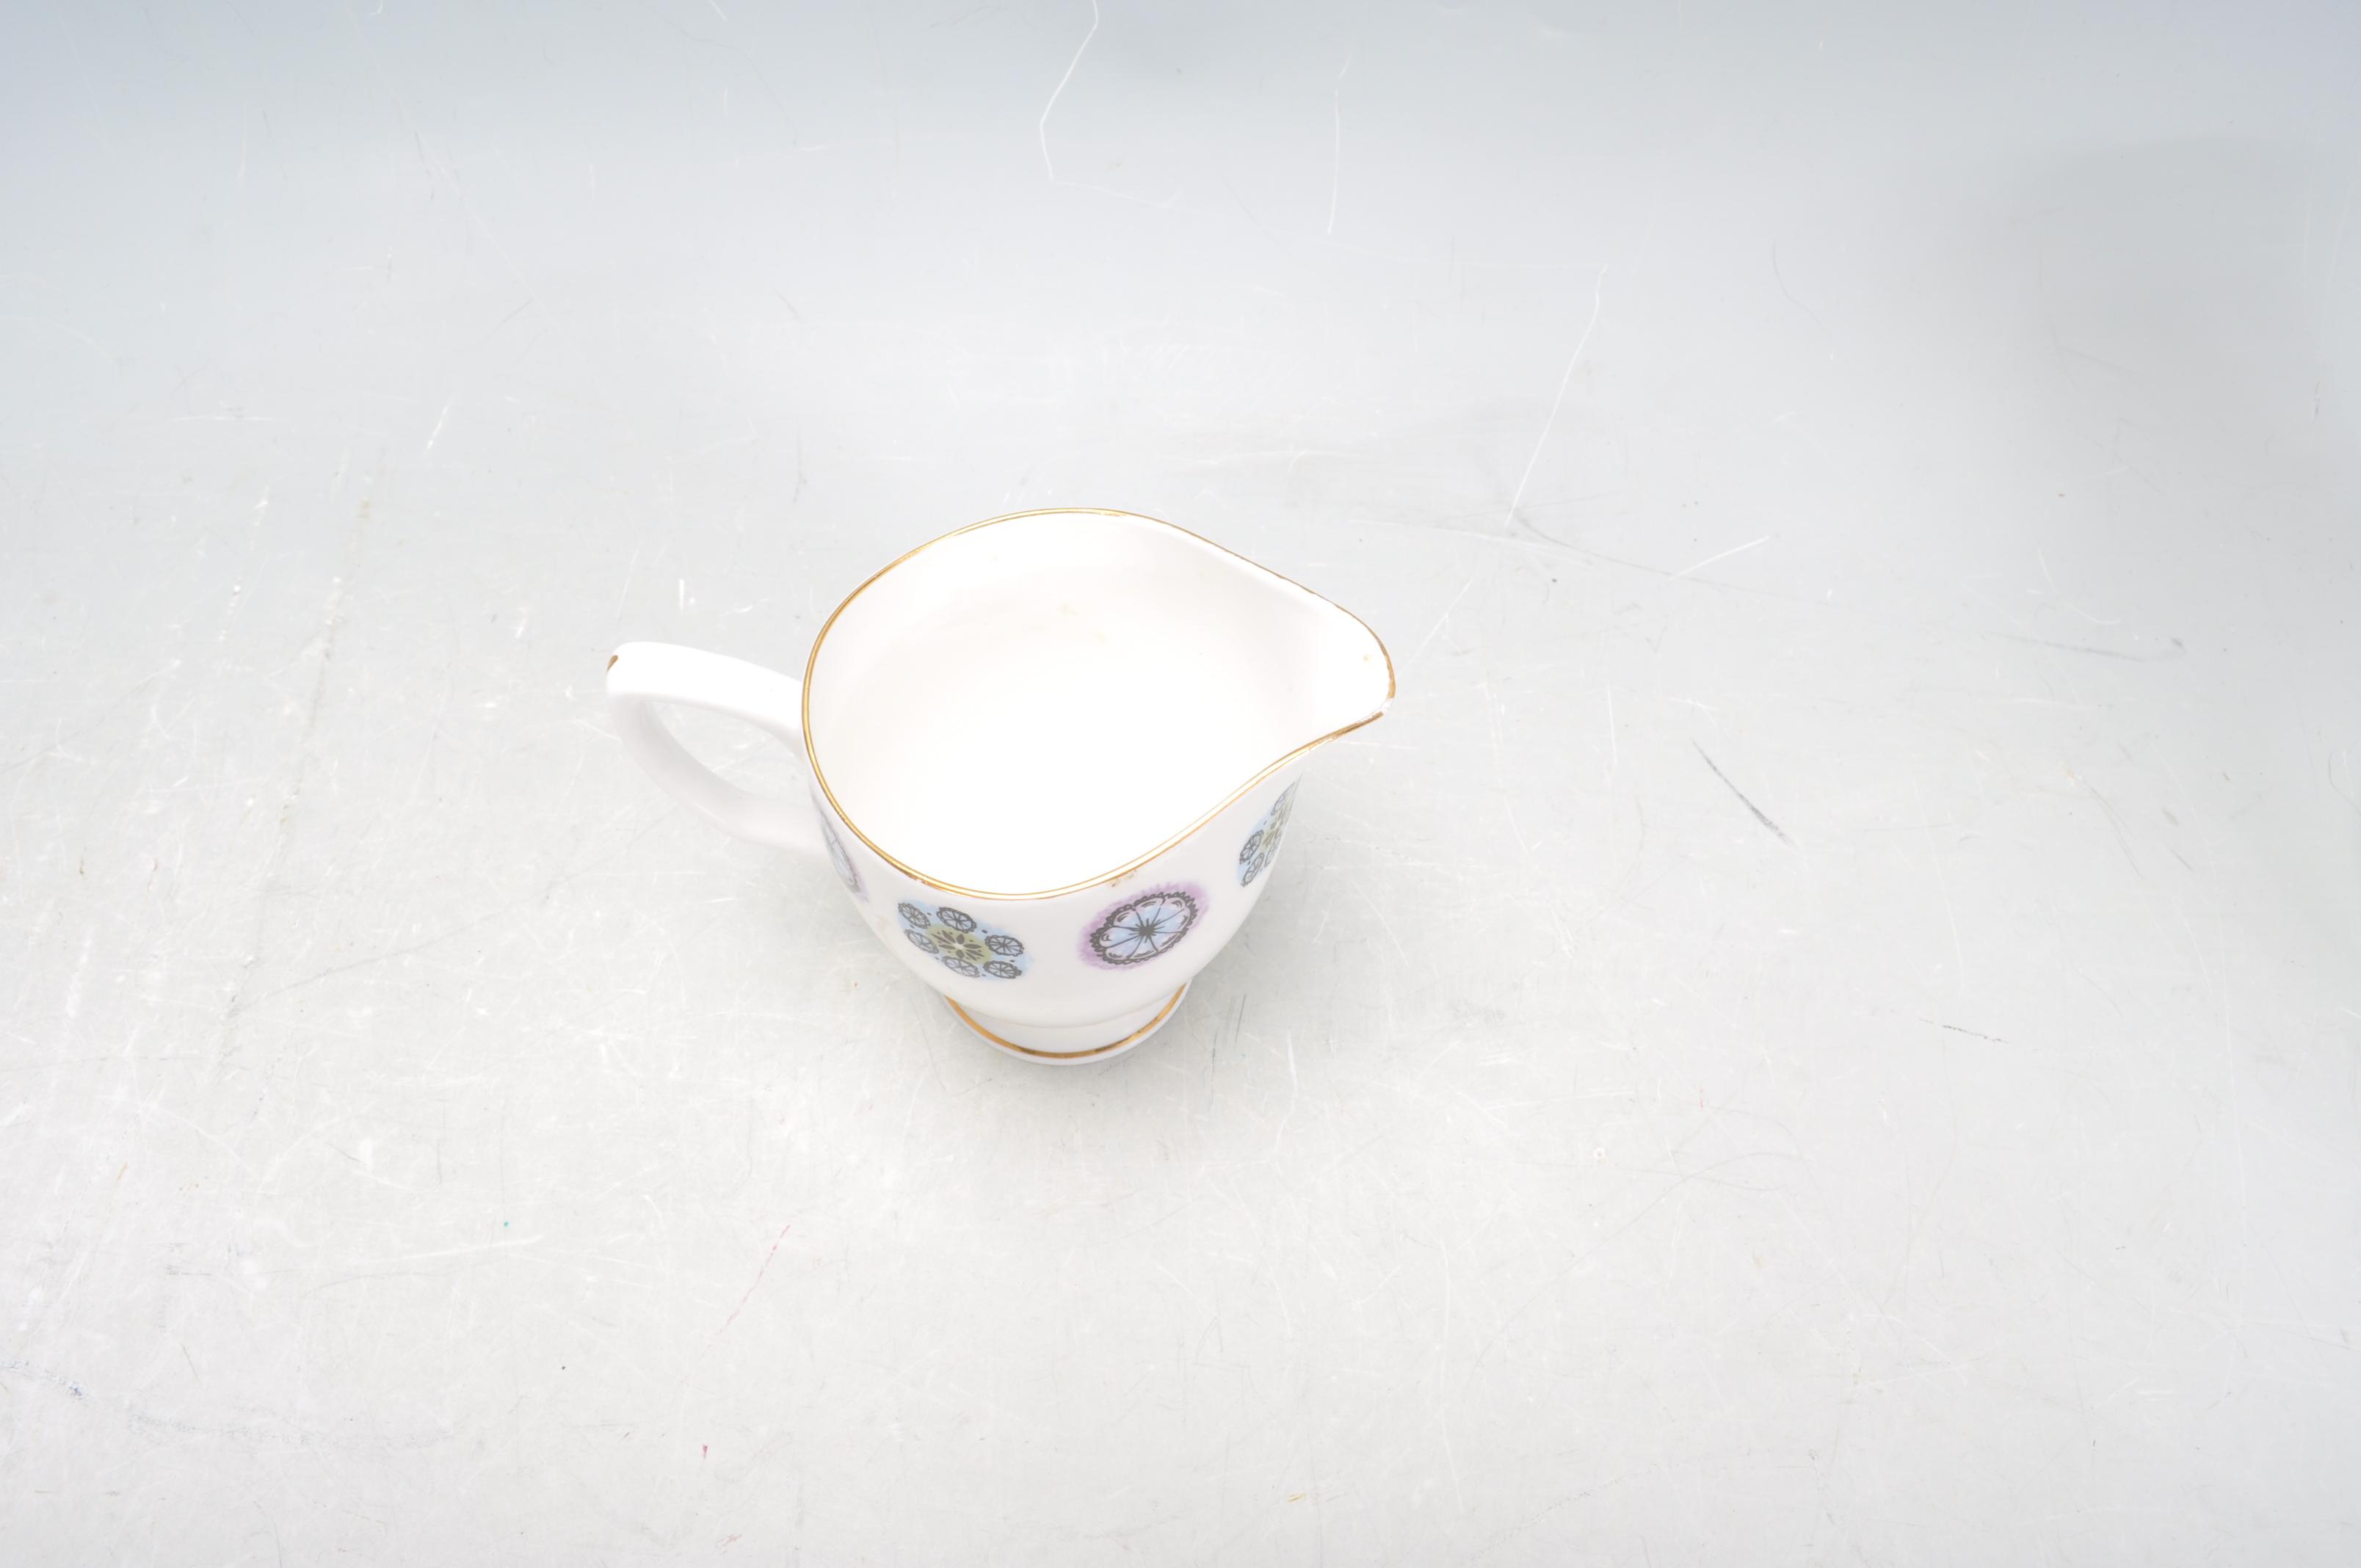 RETRO TEA SERVICE BY DUCHESS - Image 6 of 9